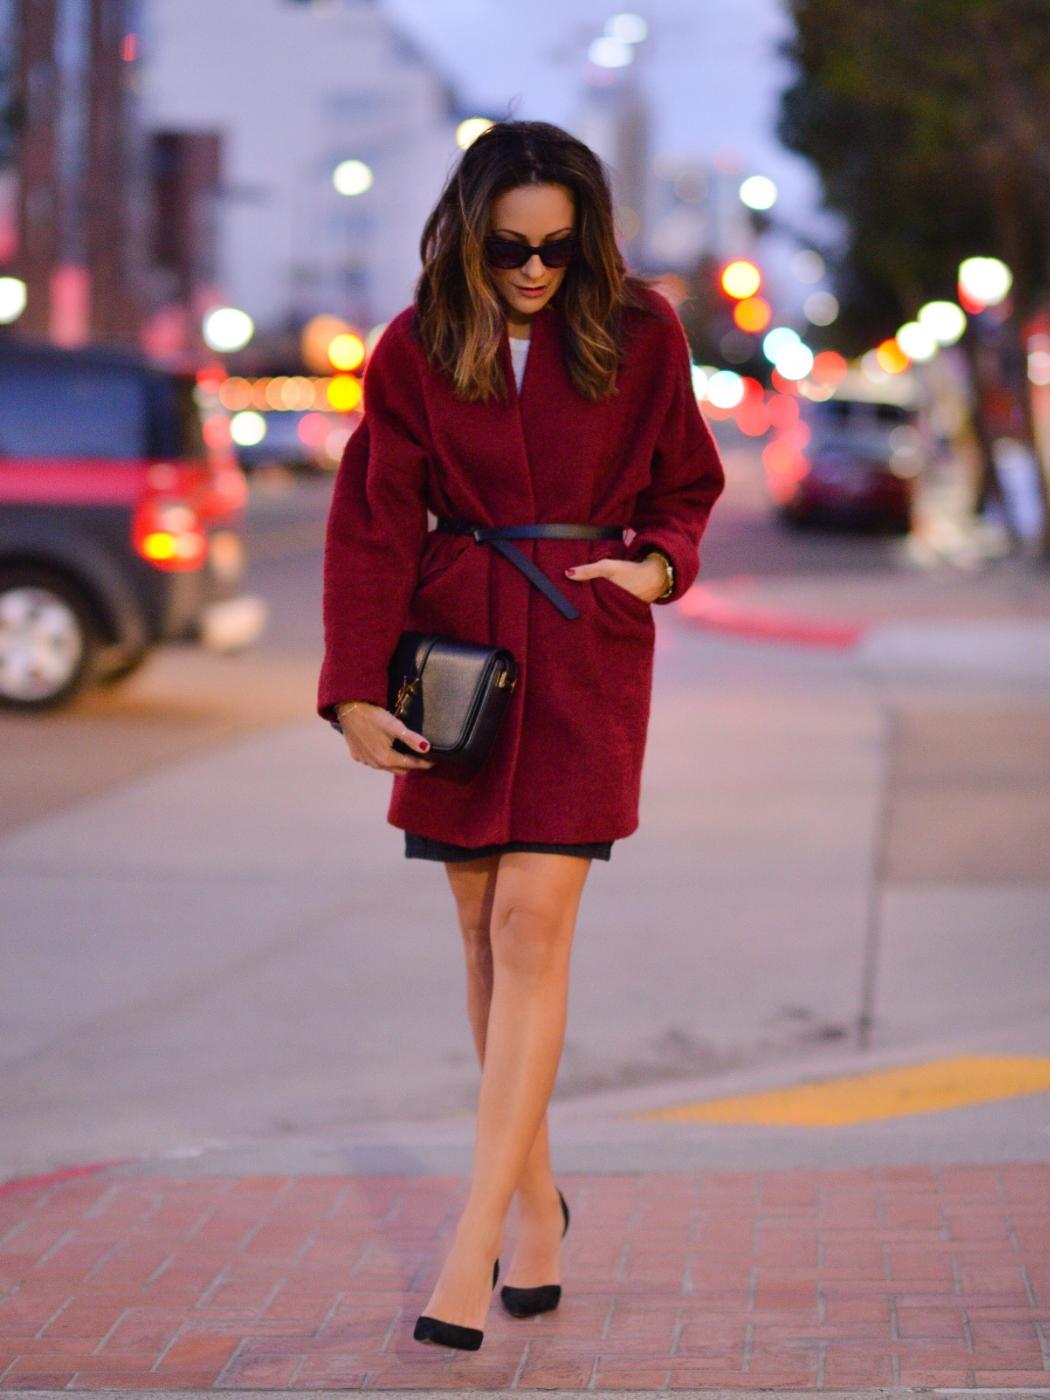 Topshop_Wool_Coat_Streetstyle_LucysWhims_FashionBlogger_SanDiego.jpg